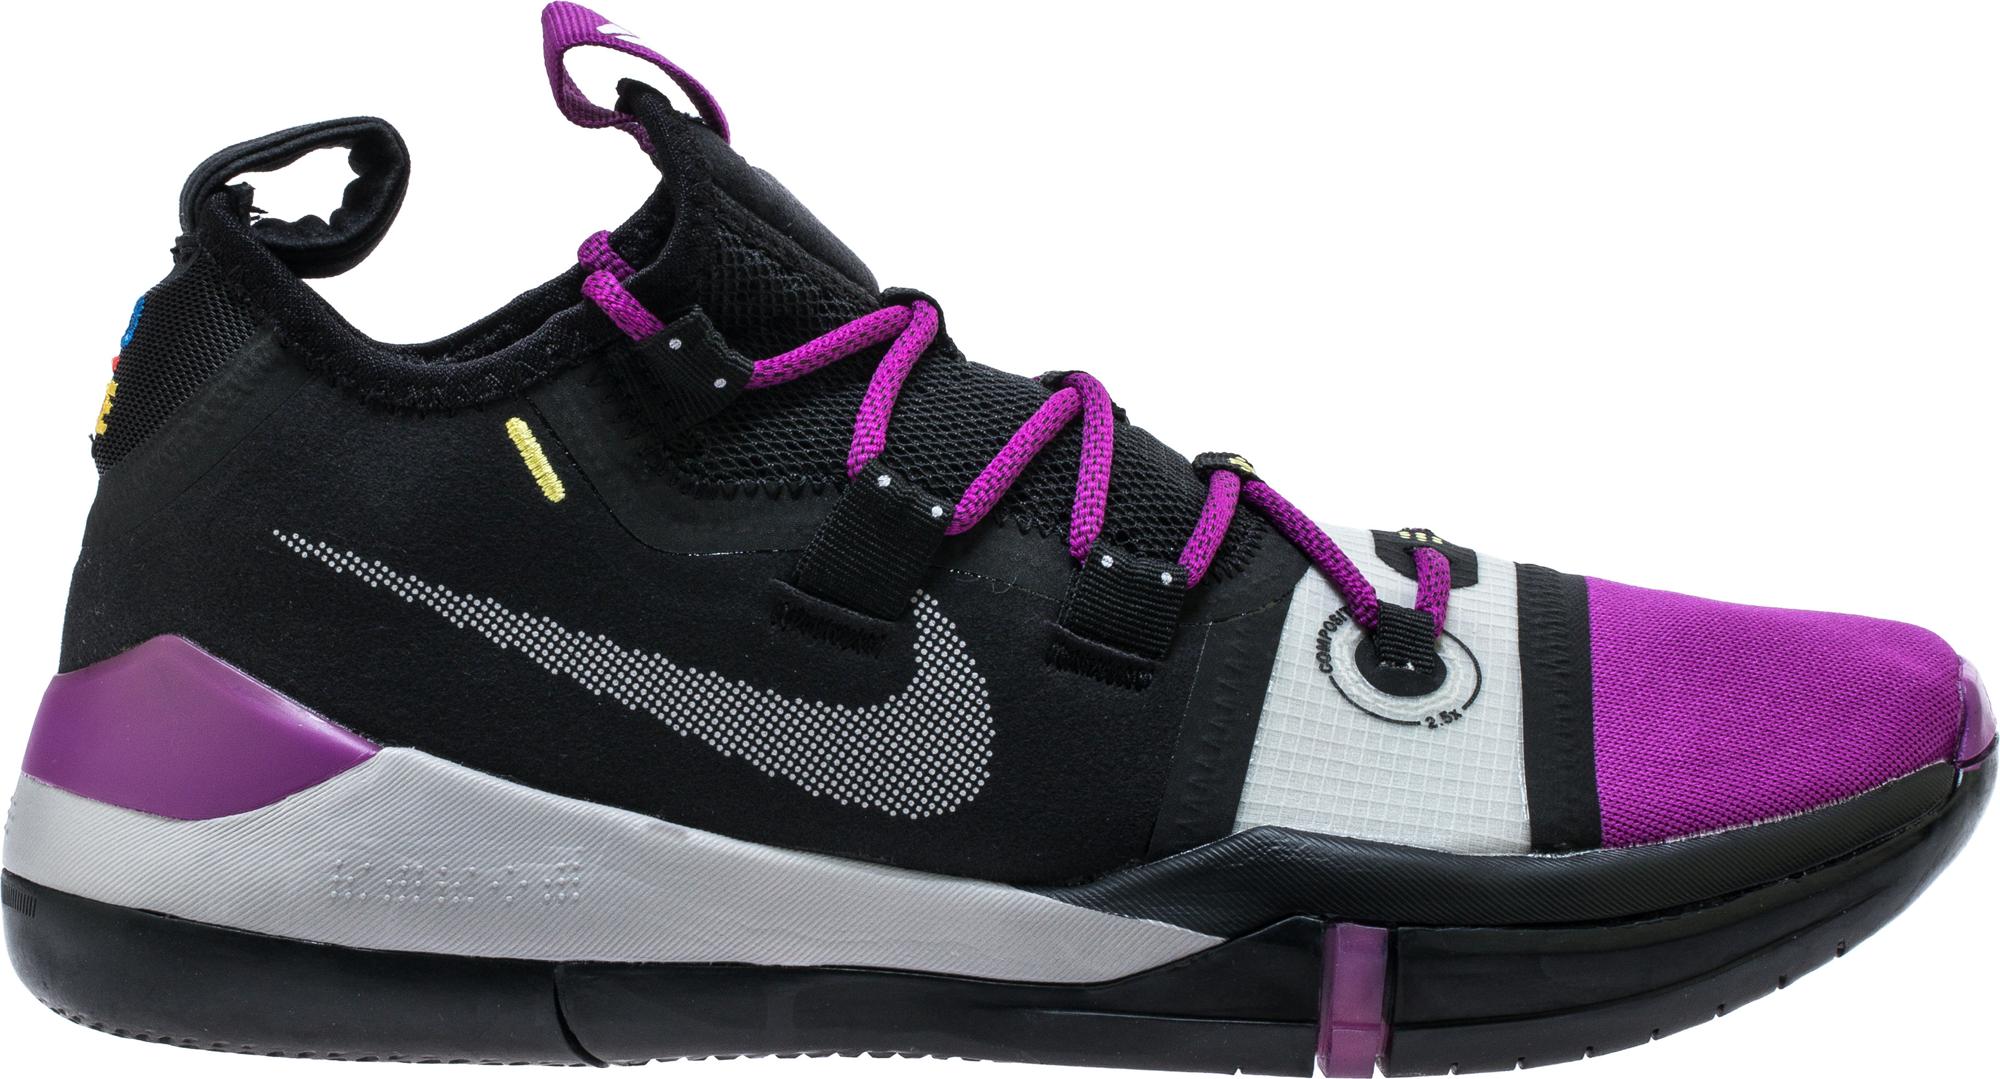 Nike Kobe AD Black Purple - AV3555-002